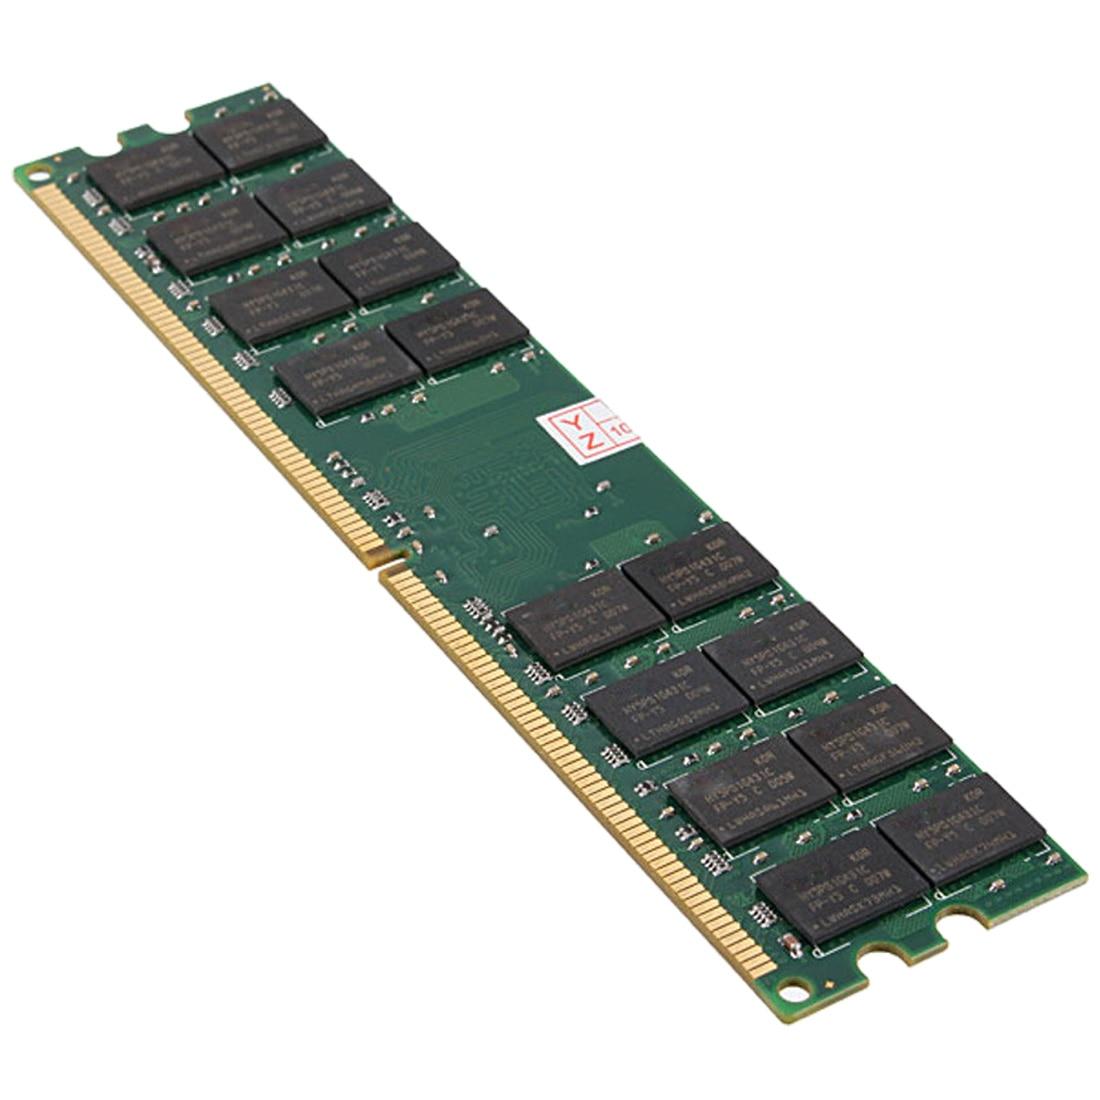 8G (2 x 4 G) Memory RAM DDR2 PC2-6400 800MHz Desktop non-ECC DIMM 240 Pin,Compatible for AMD system 4pcs 4 x 2gb ddr2 800 pc2 6400 800mhz 240pin dimm ram desktop memory only for amd motherboard